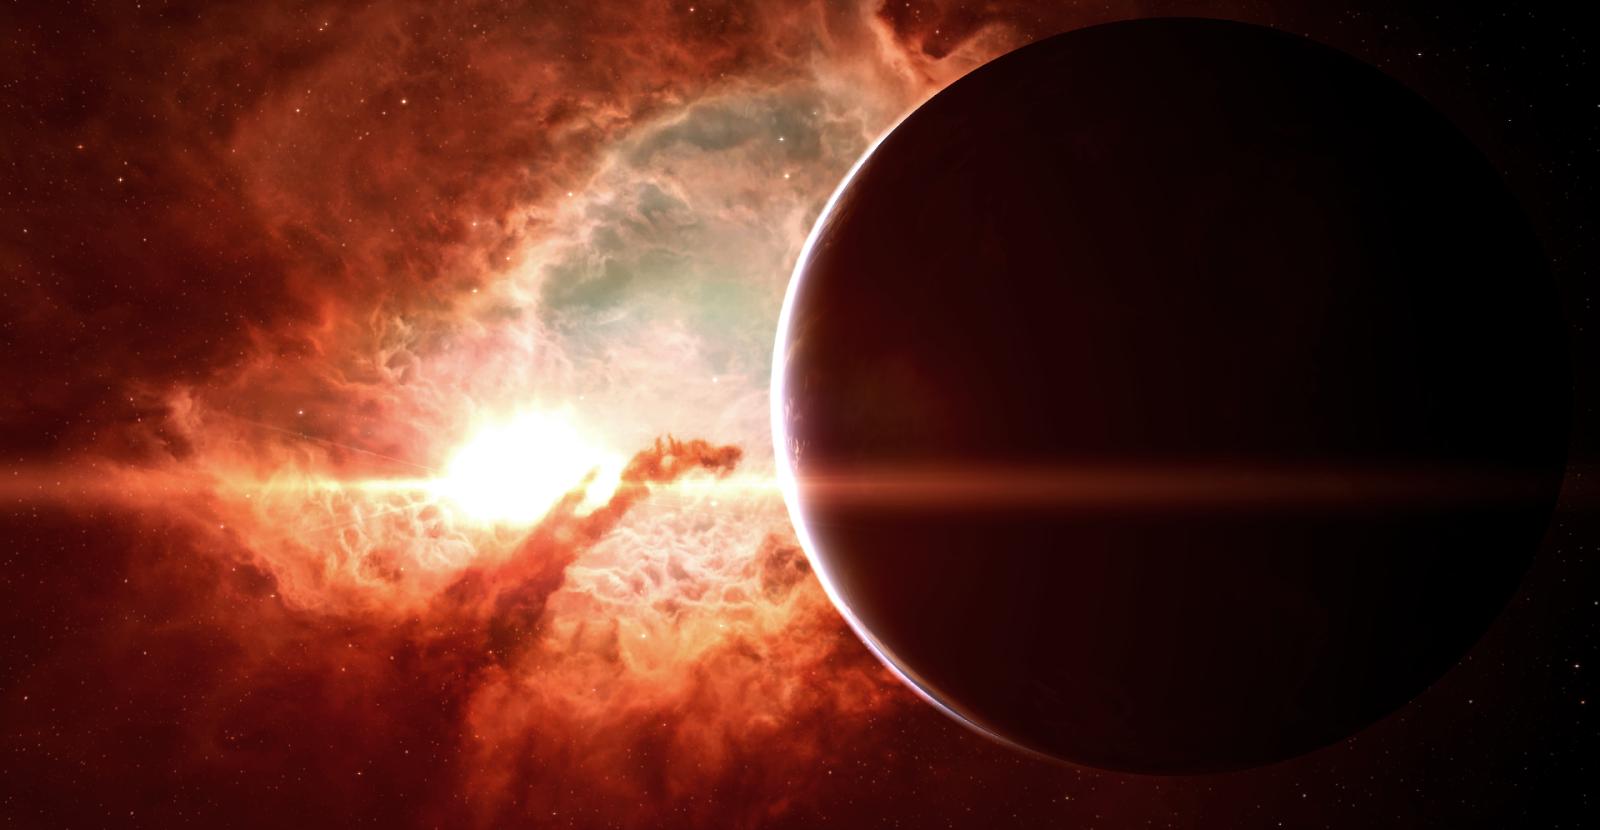 planets far - photo #22